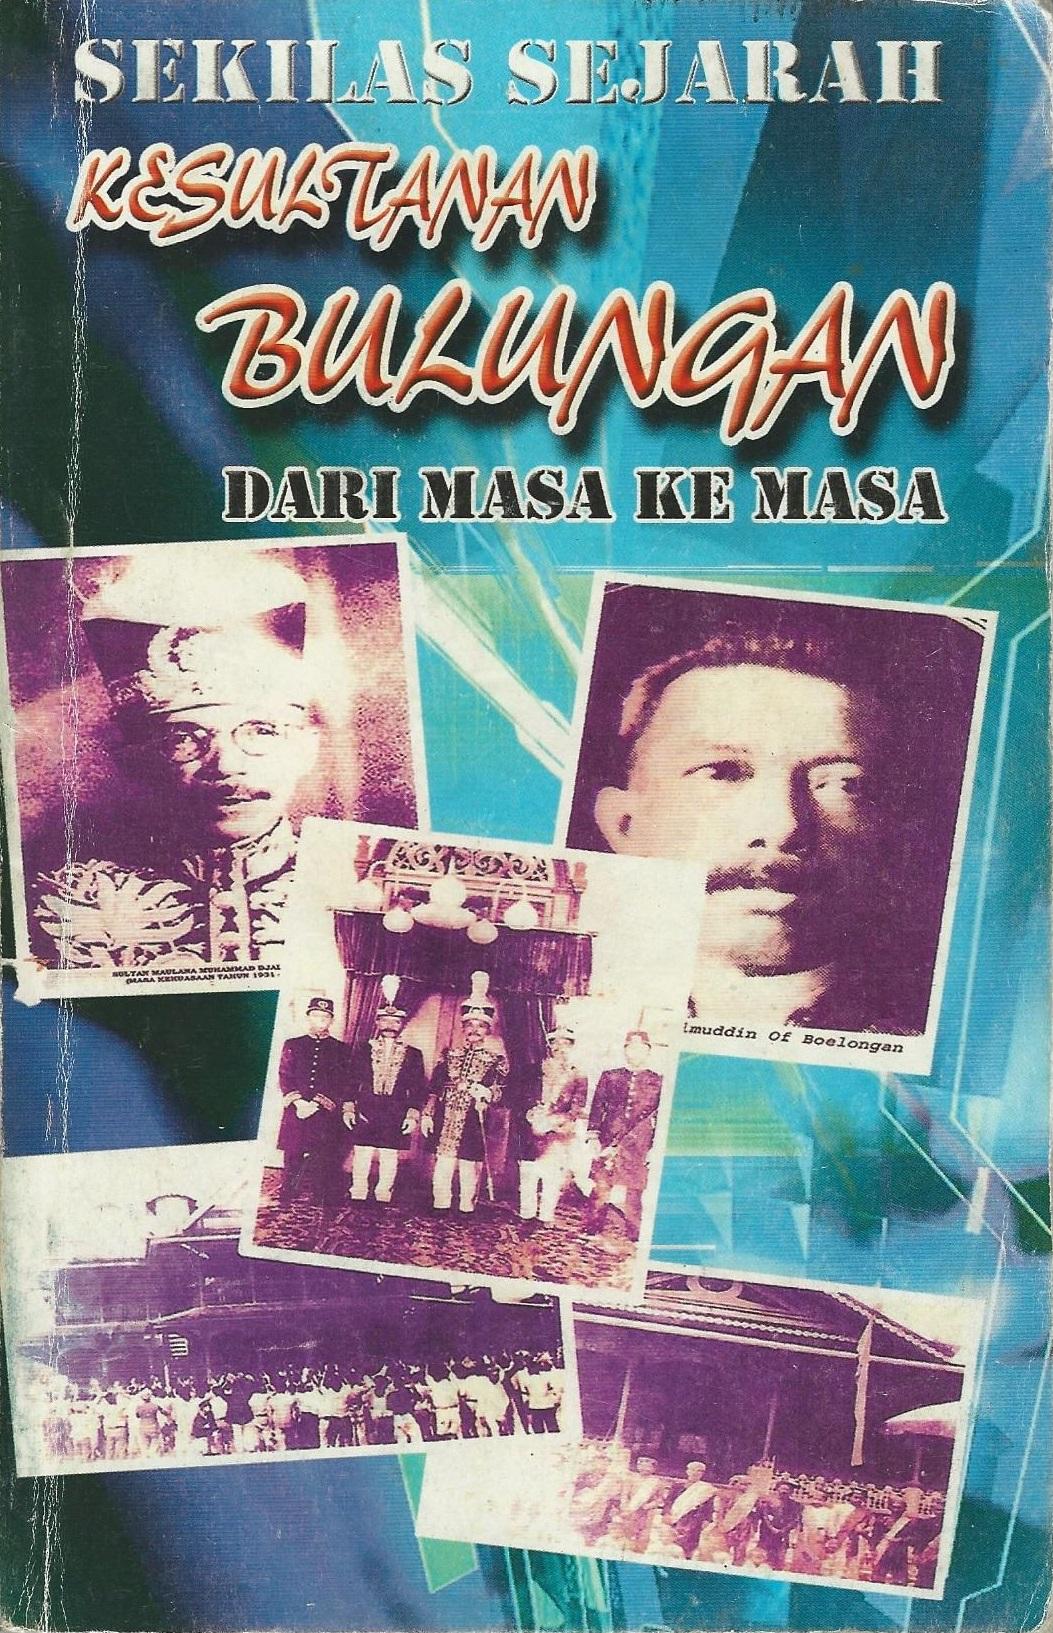 Sejarah Kesultanan Bulungan Handokowidagdo Indonesiana Istana Olahraga Air Kab